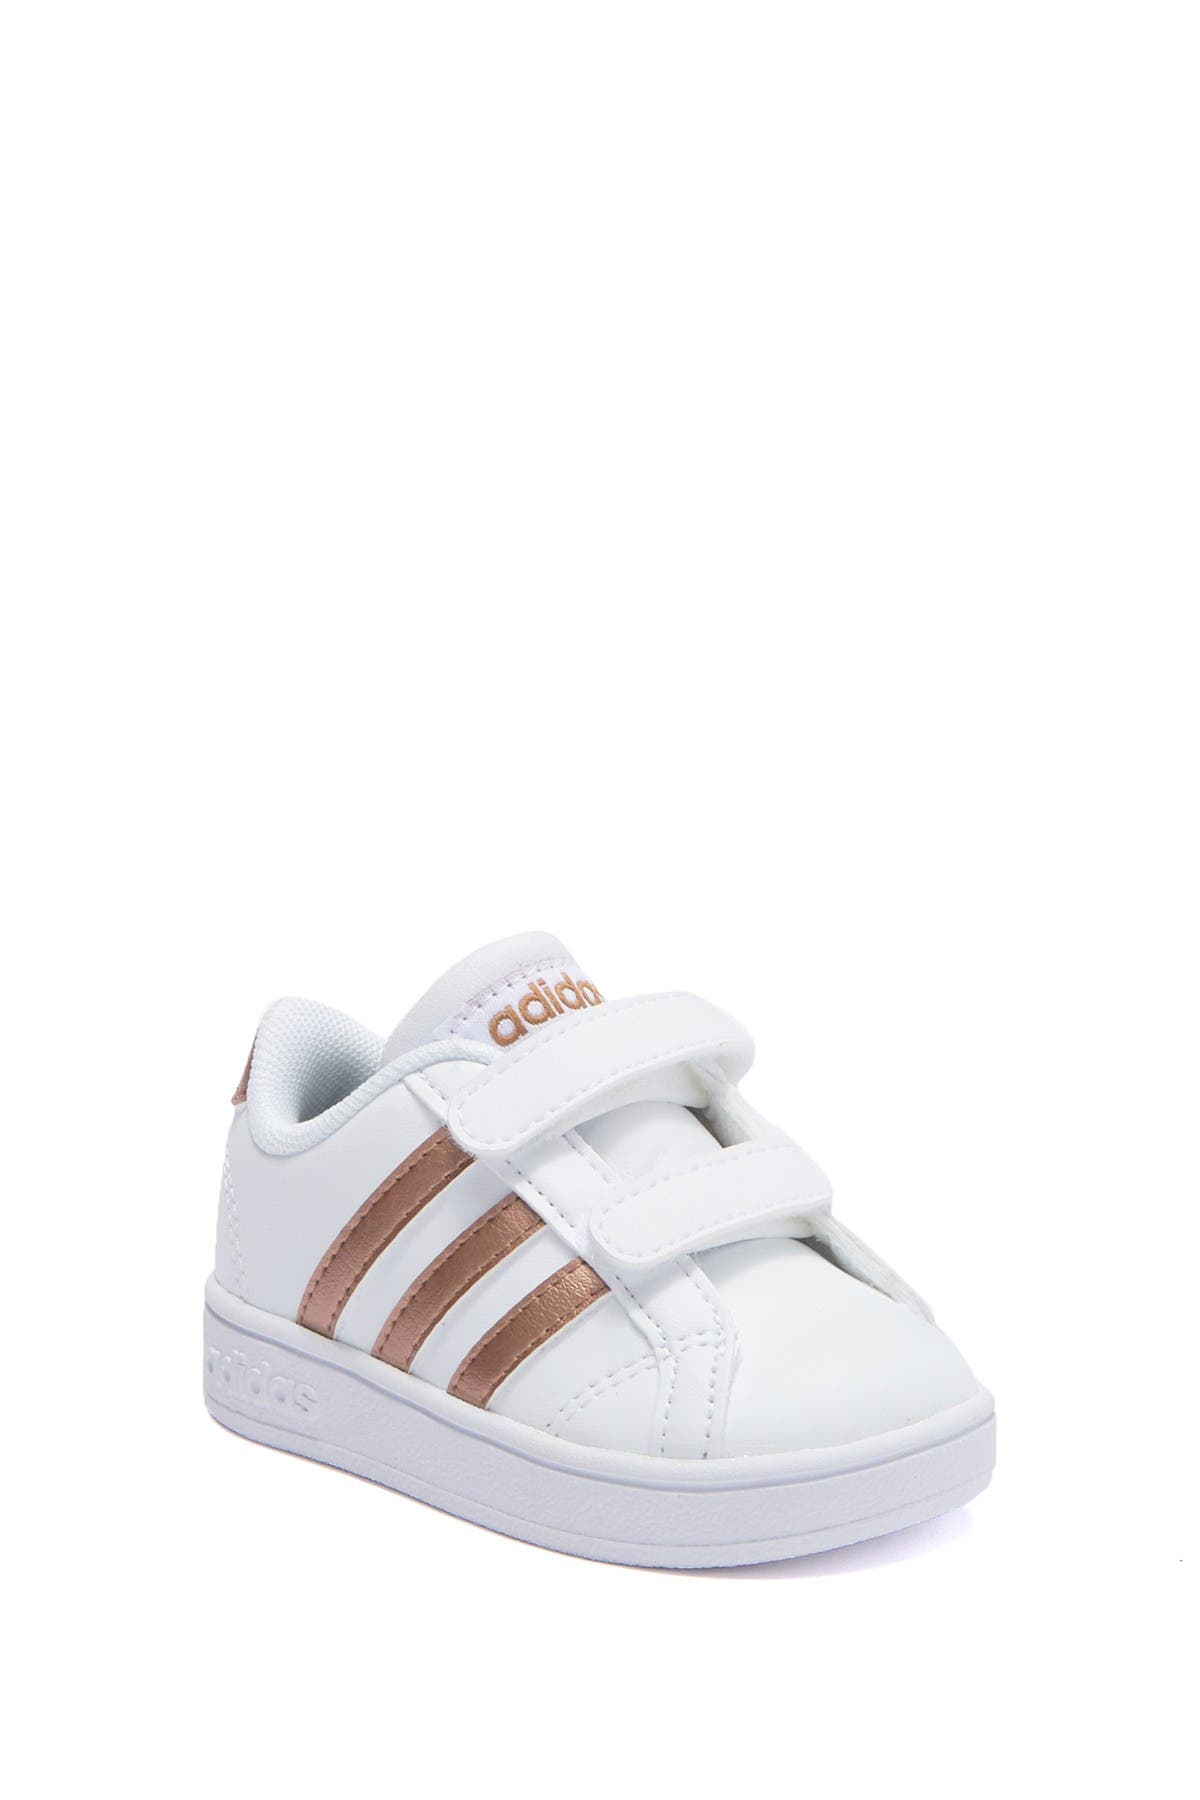 Image of adidas Baseline CMF Sneaker